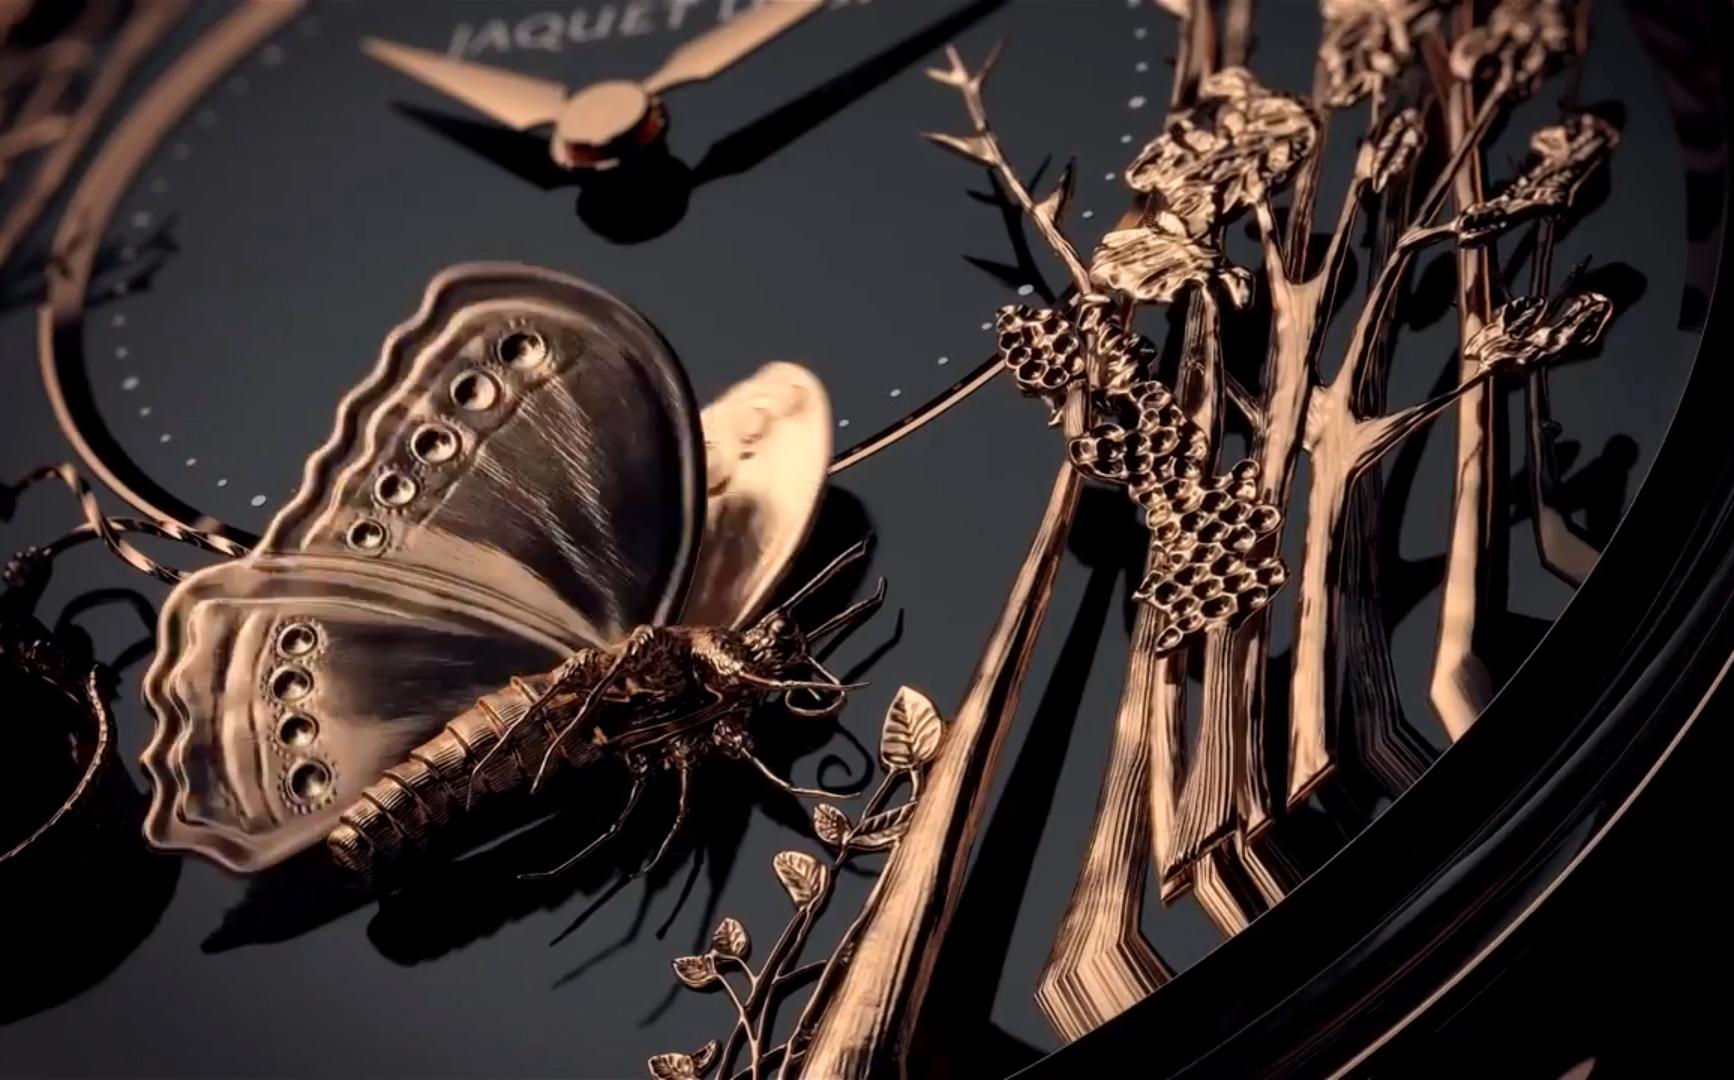 Loving Butterfly Automaton / фото © Jaquet Droz